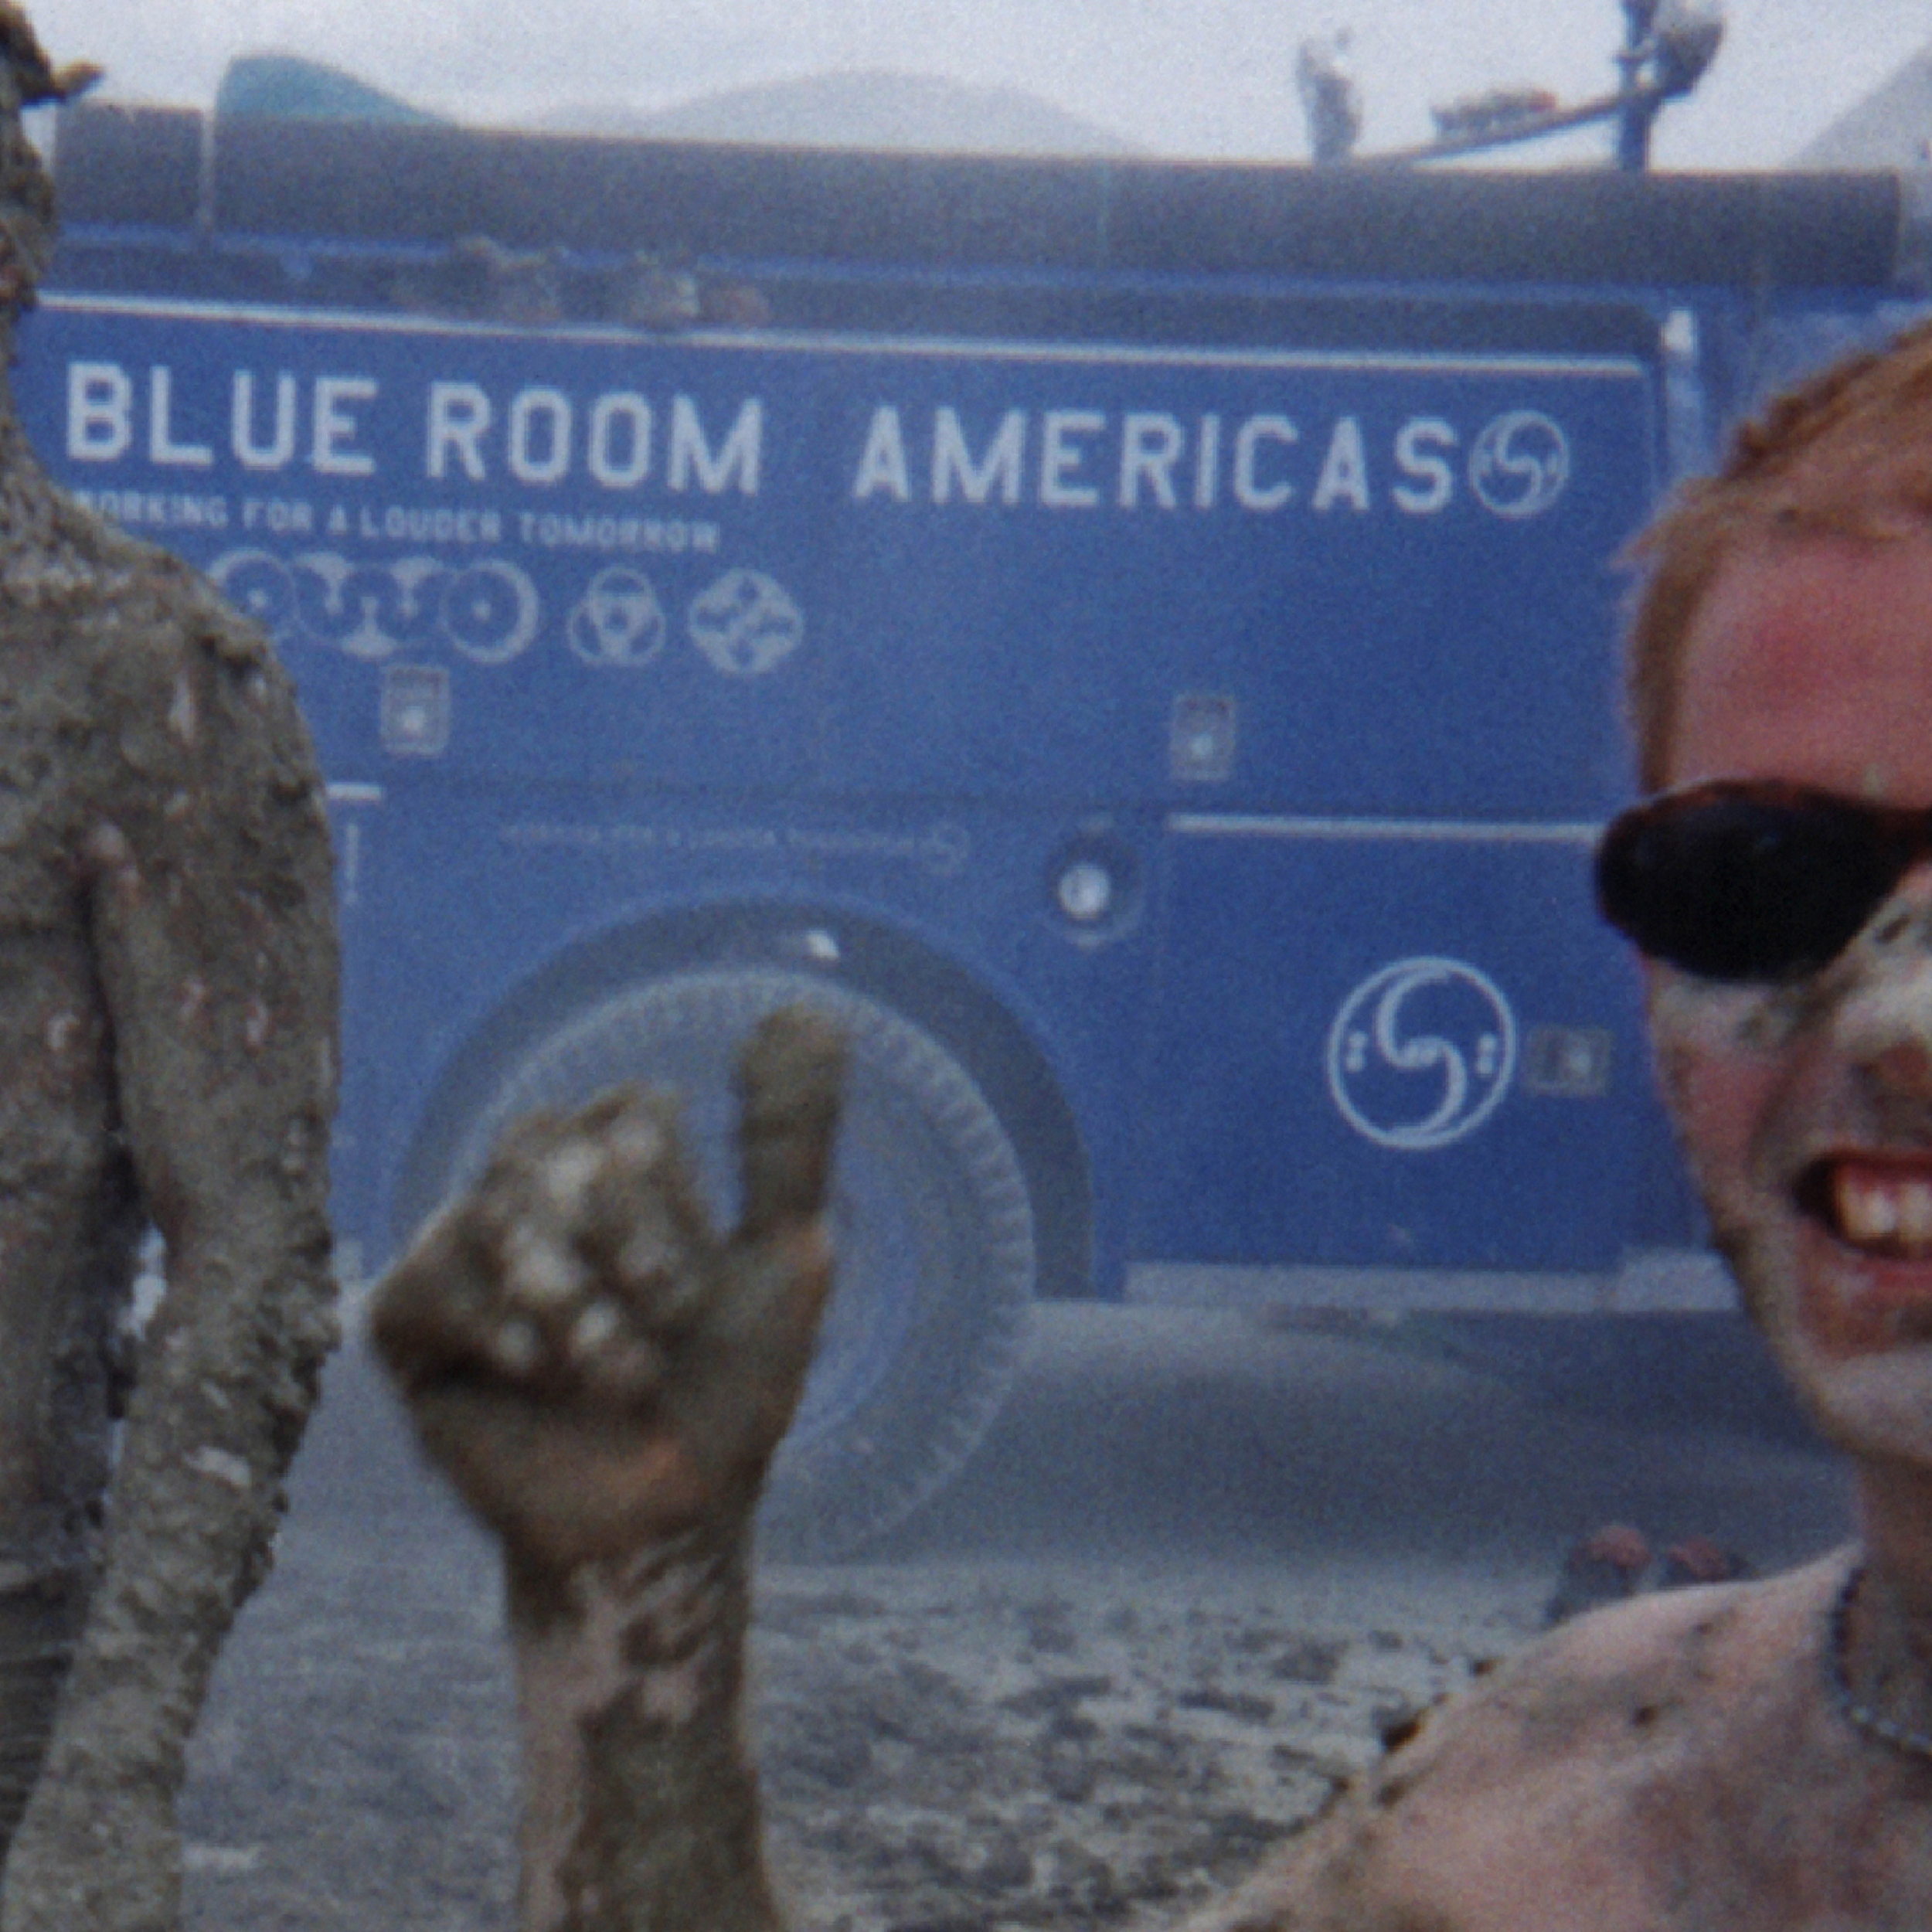 Blue Room Americas Fire Truck - 1998 Burning man, Nevada USAno better way of raising musical awareness at burning man than a bright blue fire truck